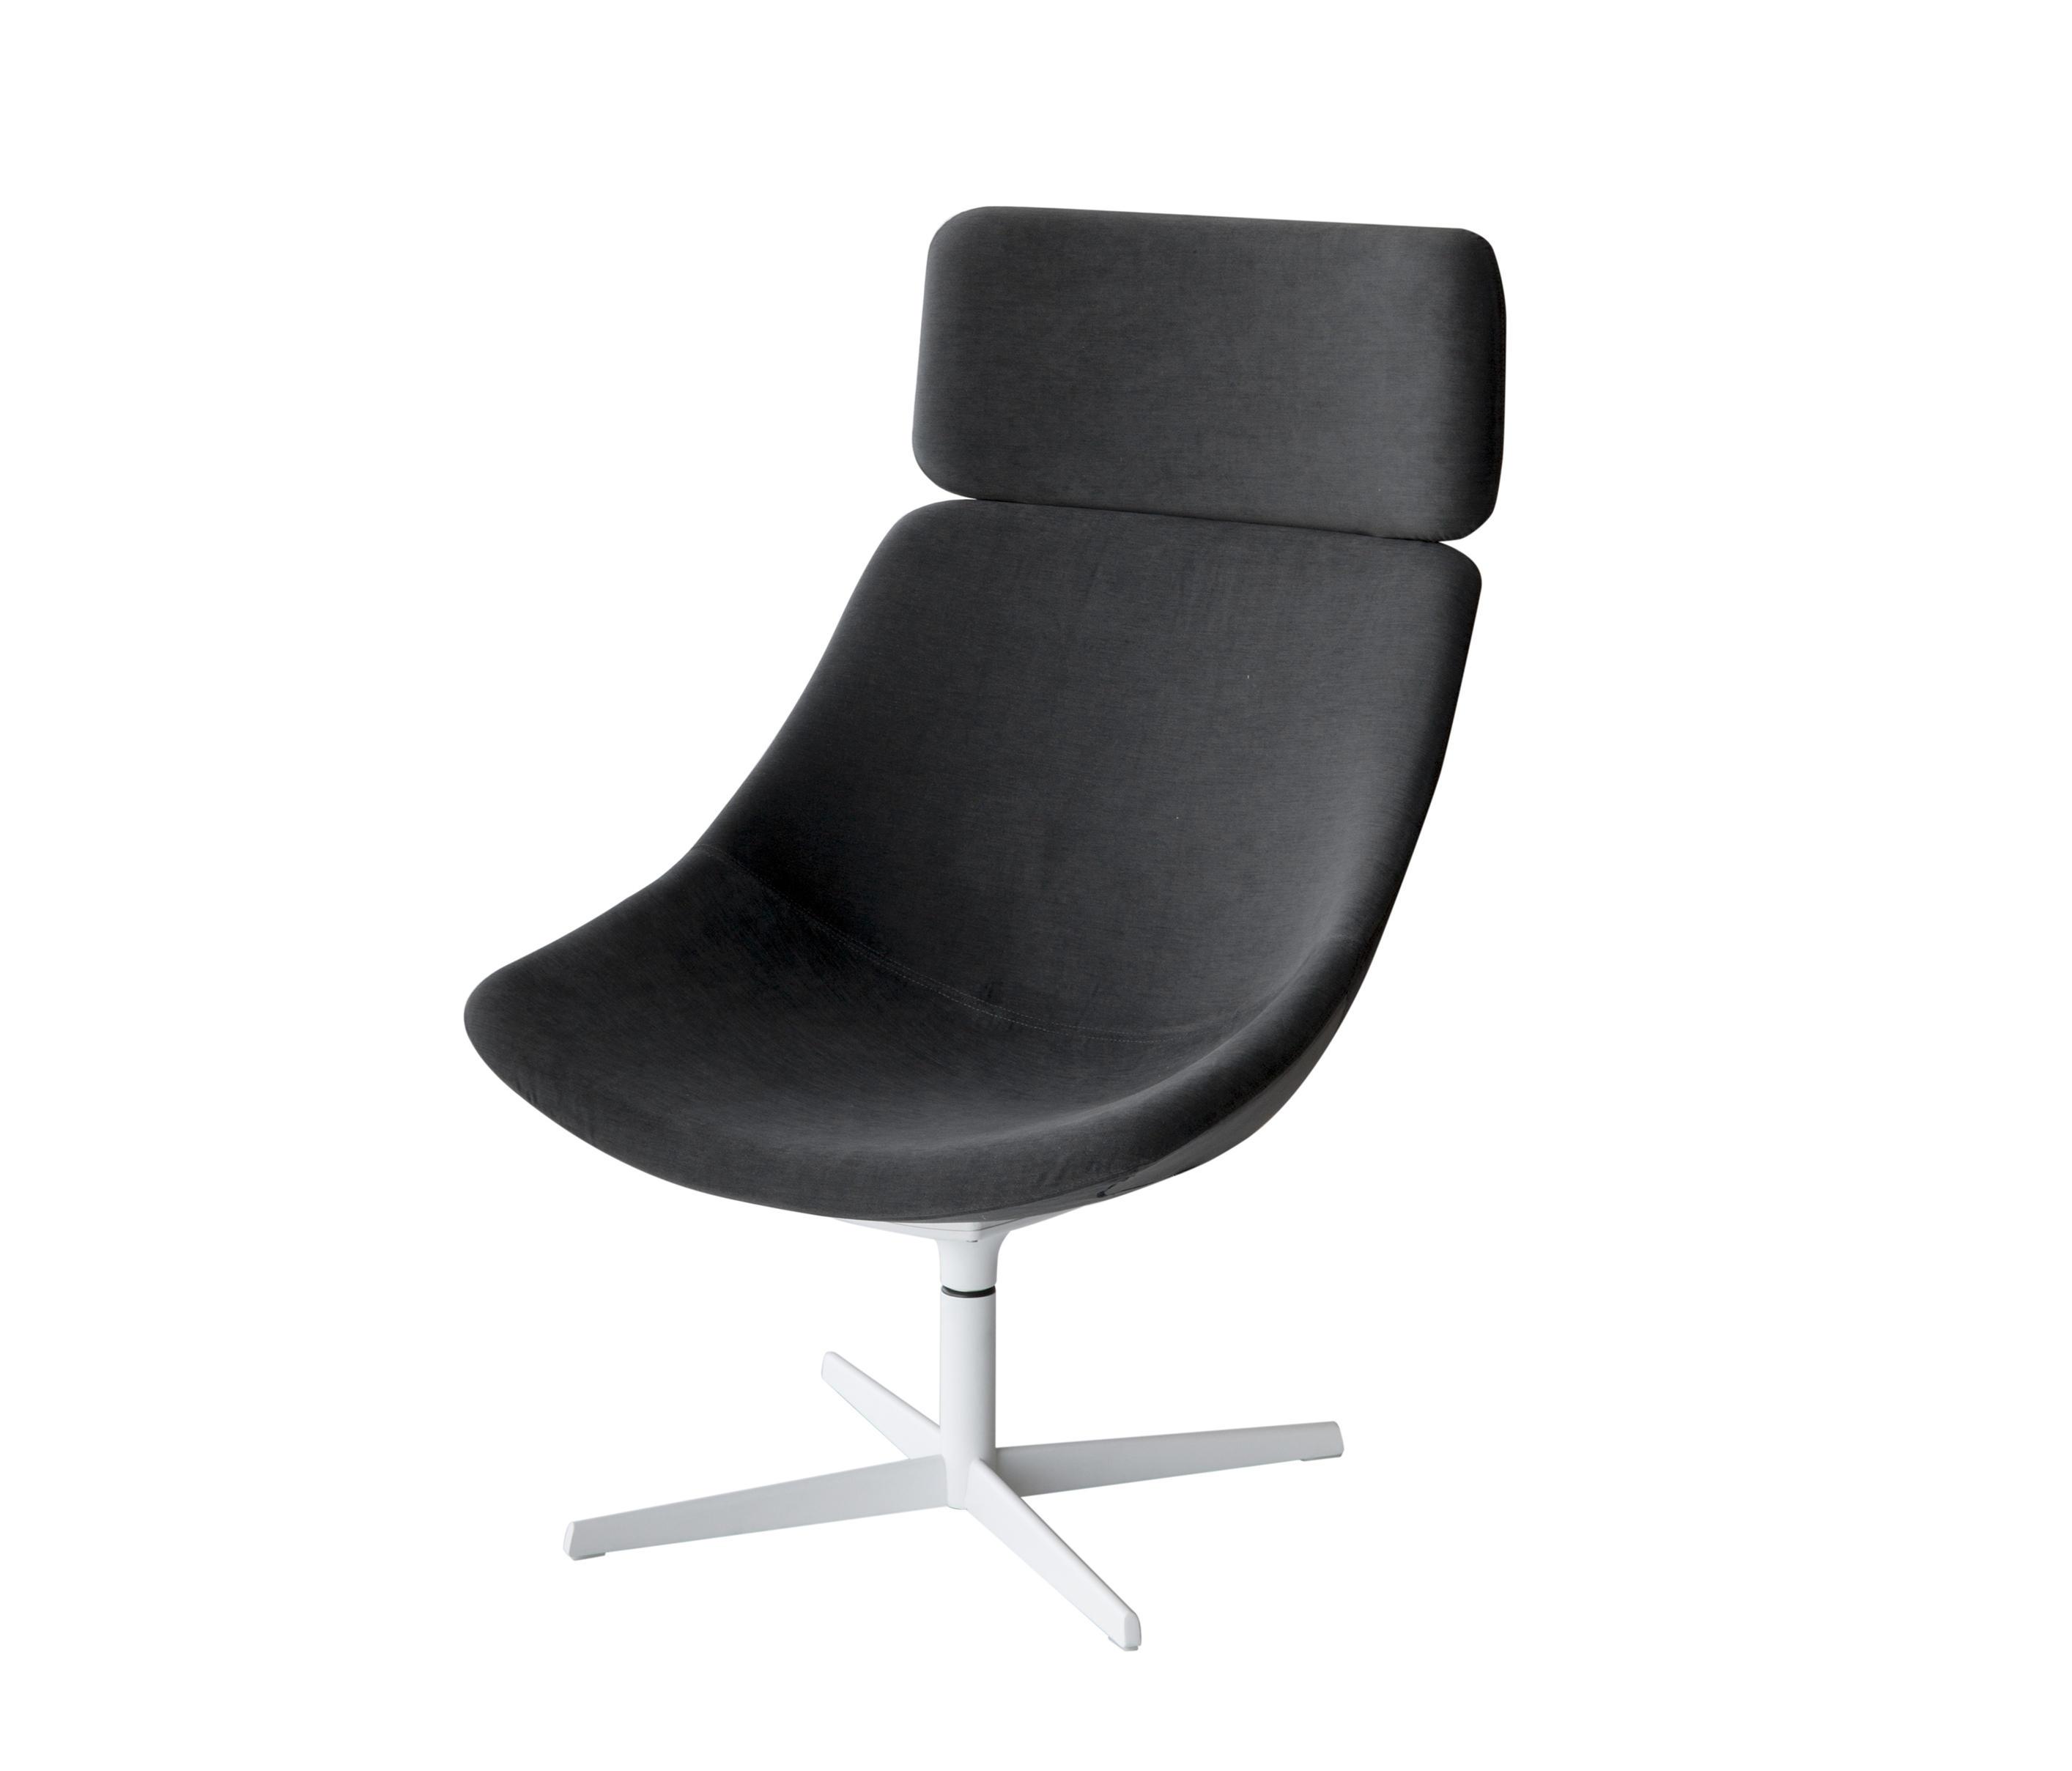 AUKI - Sessel von lapalma | Architonic